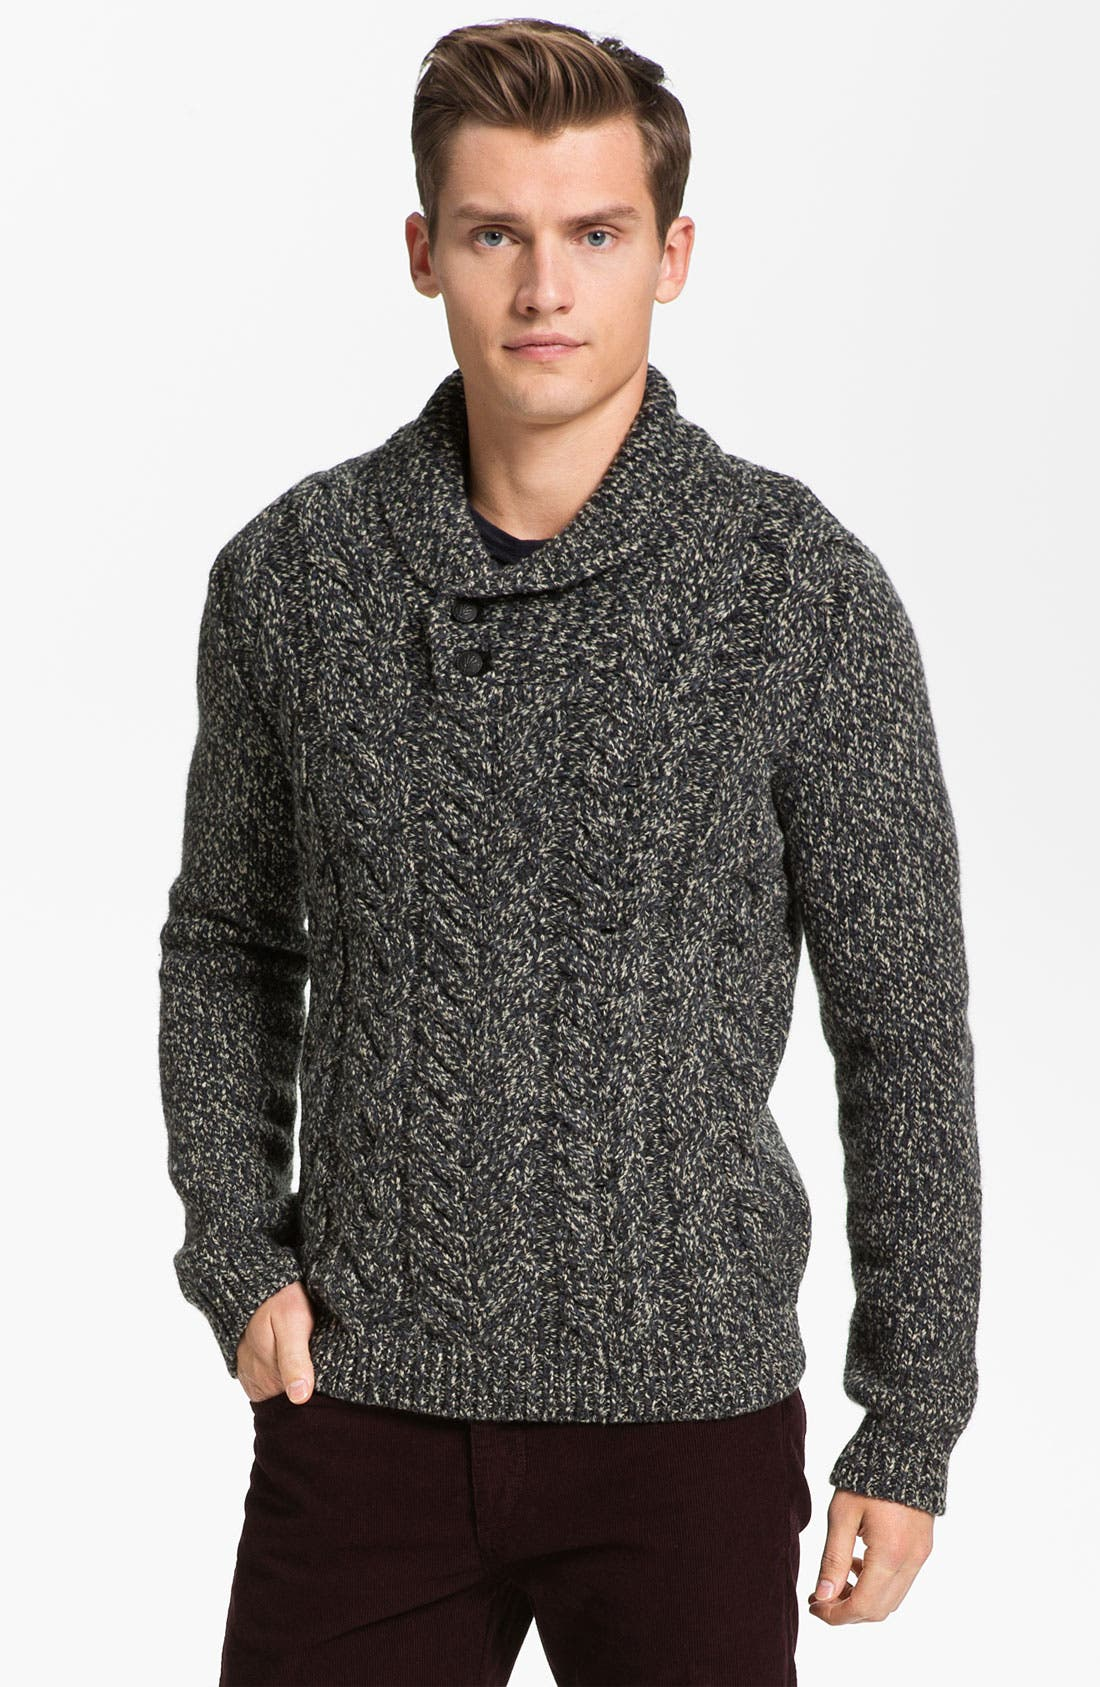 Alternate Image 1 Selected - rag & bone 'Buxton' Shawl Collar Sweater